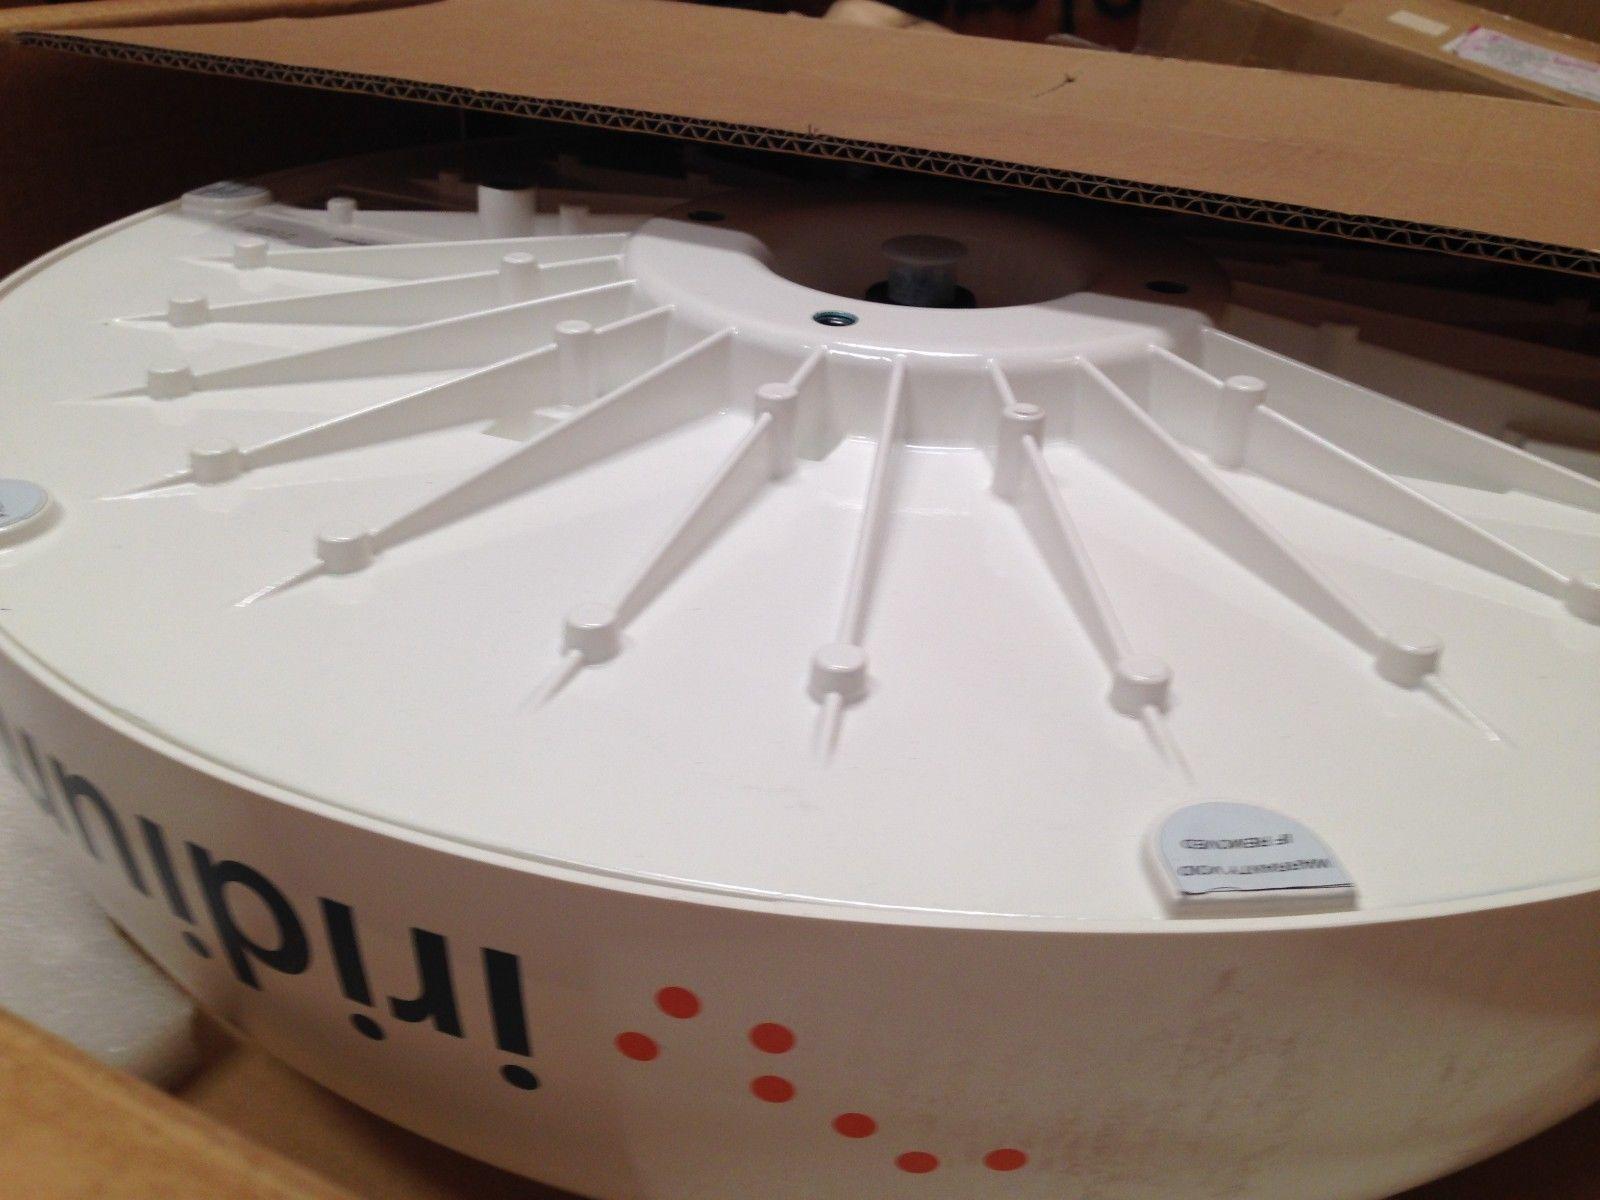 Set-of-iridium-pilot-satellite-decks-bade1203-below-decks-equipment-model-9701